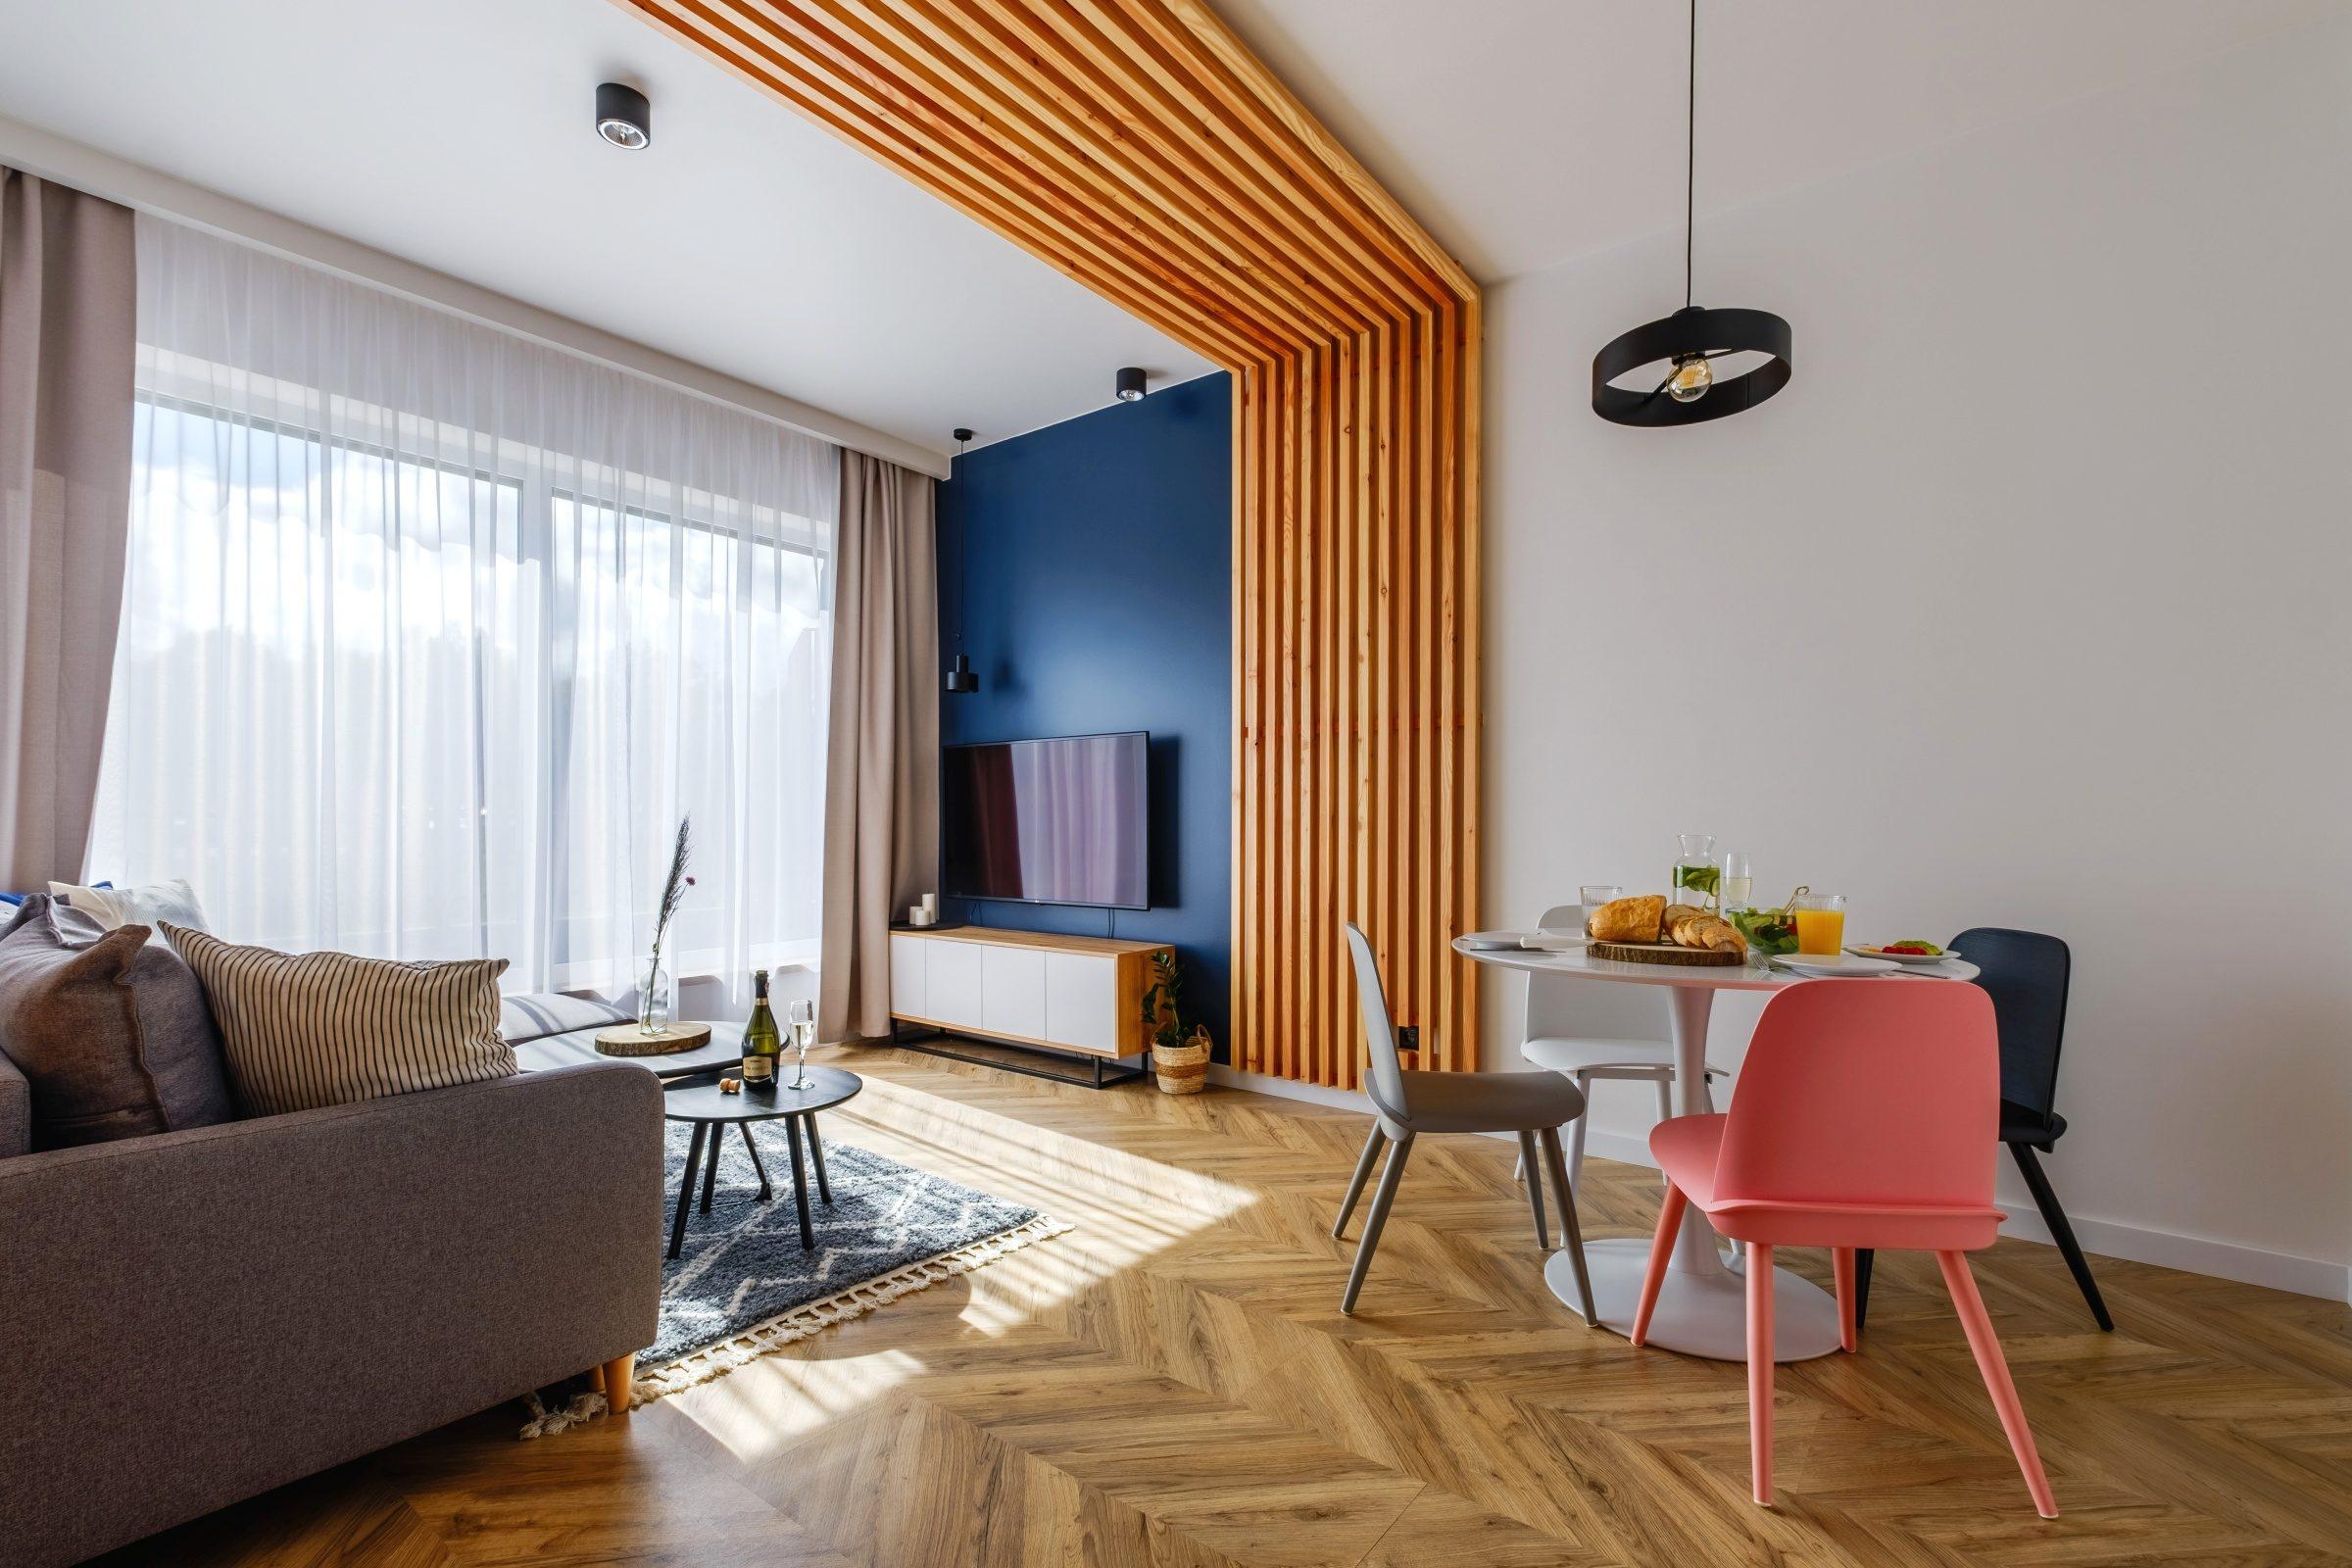 Apartamenty NOVA BIAŁKA Białka Tatrzańska apartament 6 salon 4